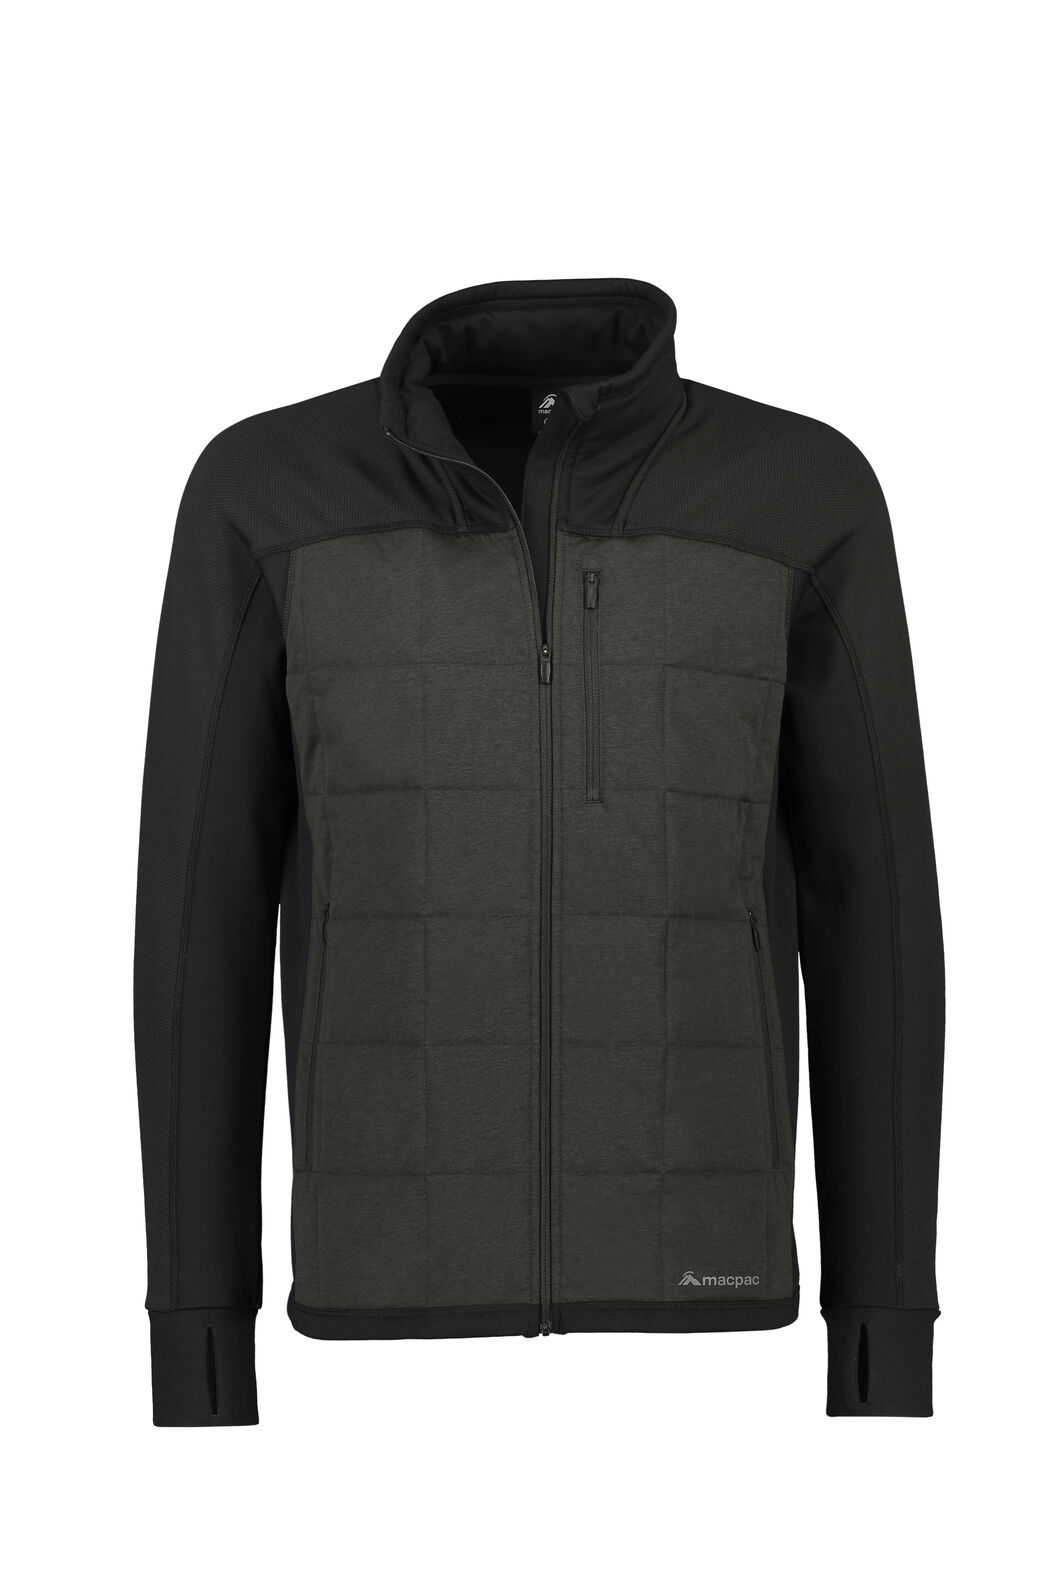 Macpac Accelerate PrimaLoft® Fleece Jacket — Men's, Black, hi-res